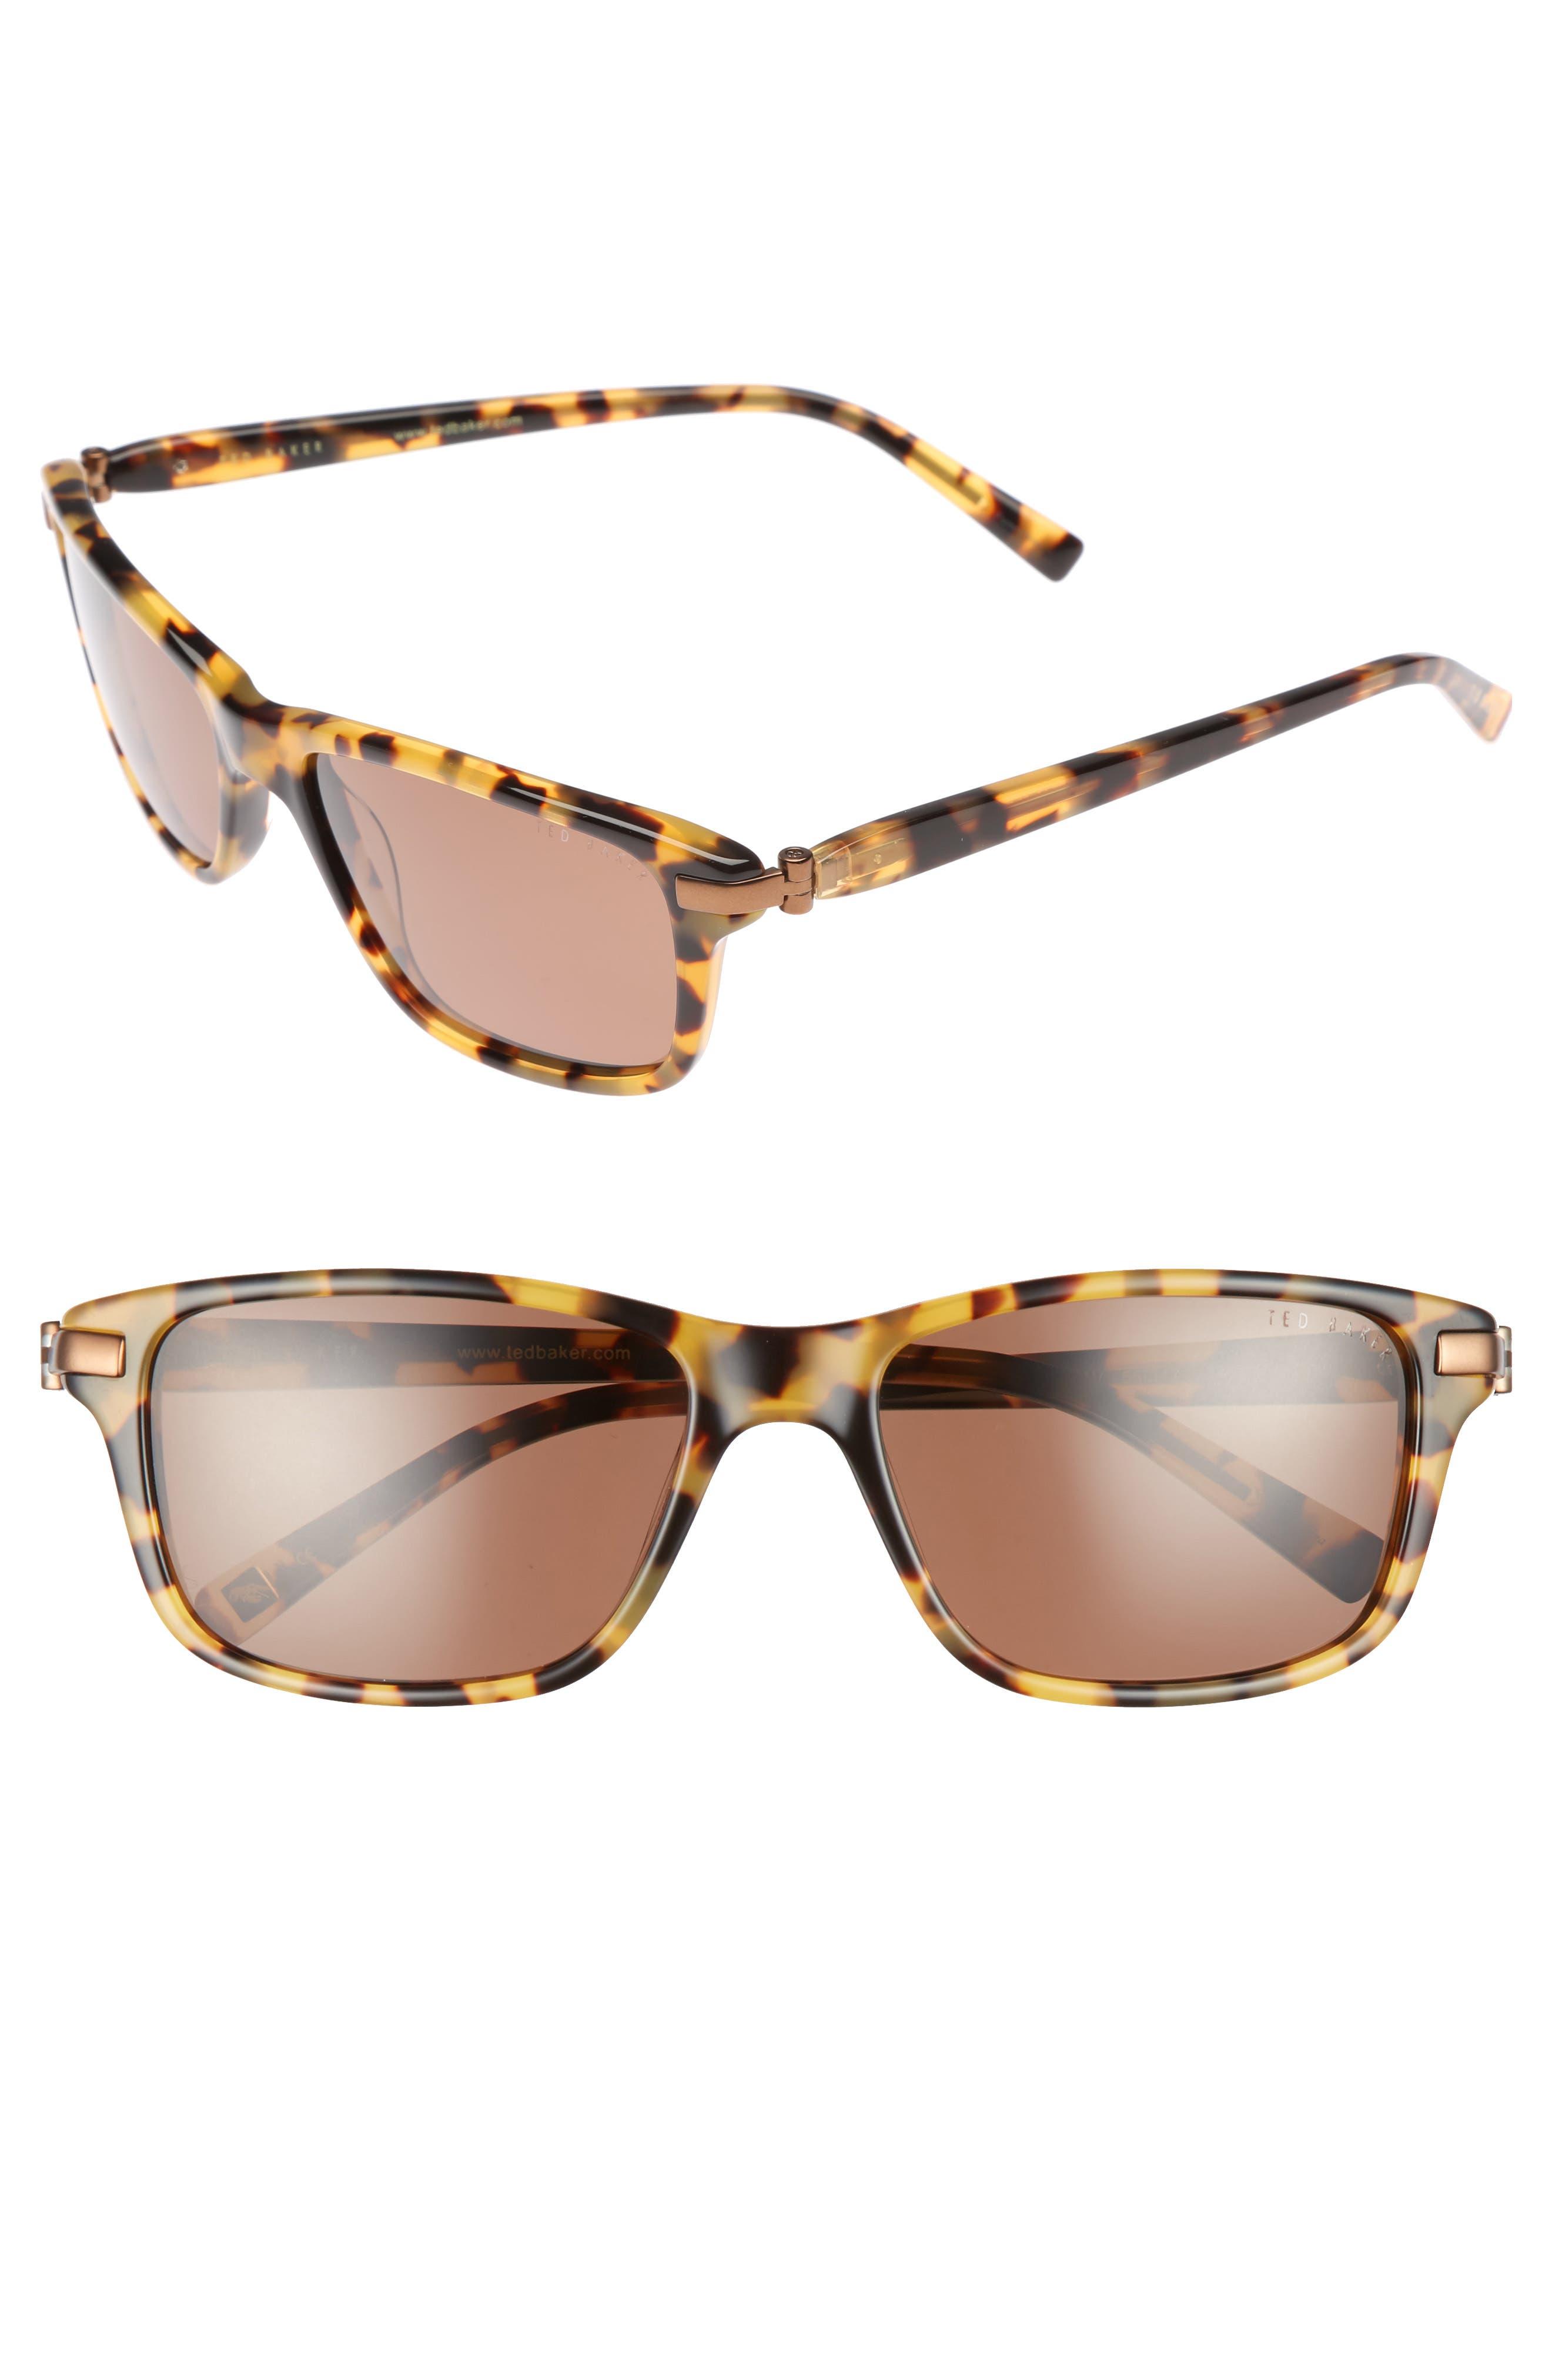 55mm Polarized Sunglasses,                         Main,                         color, Havana